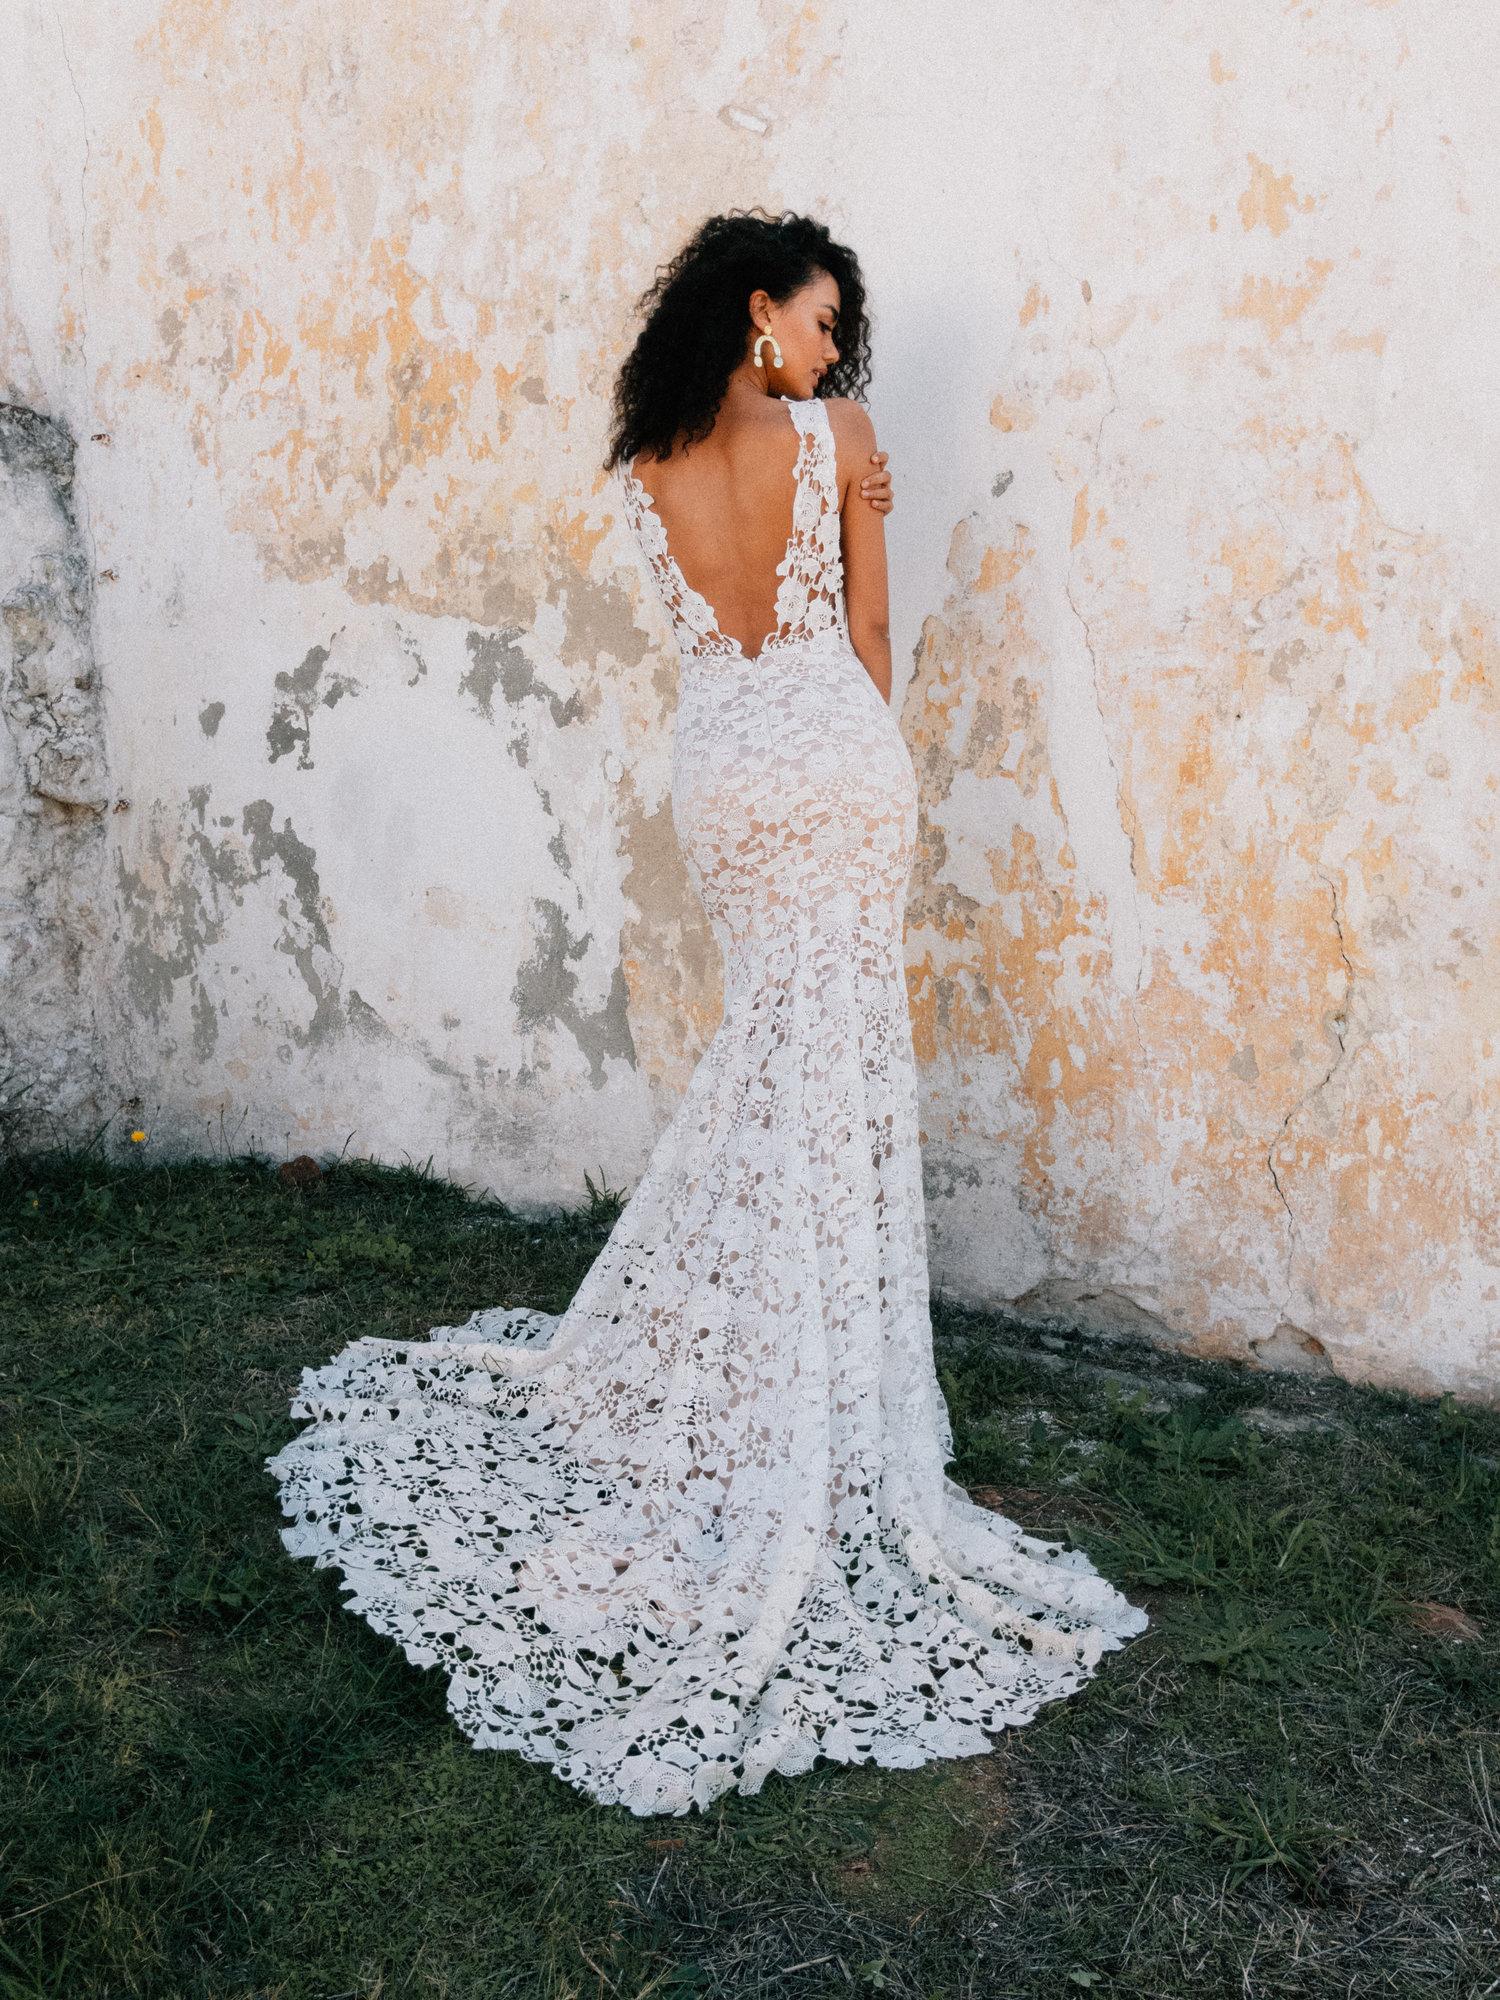 Laudae Trunk Show Arc Bridal Omaha Nebraska,Sample Sale Wedding Dresses